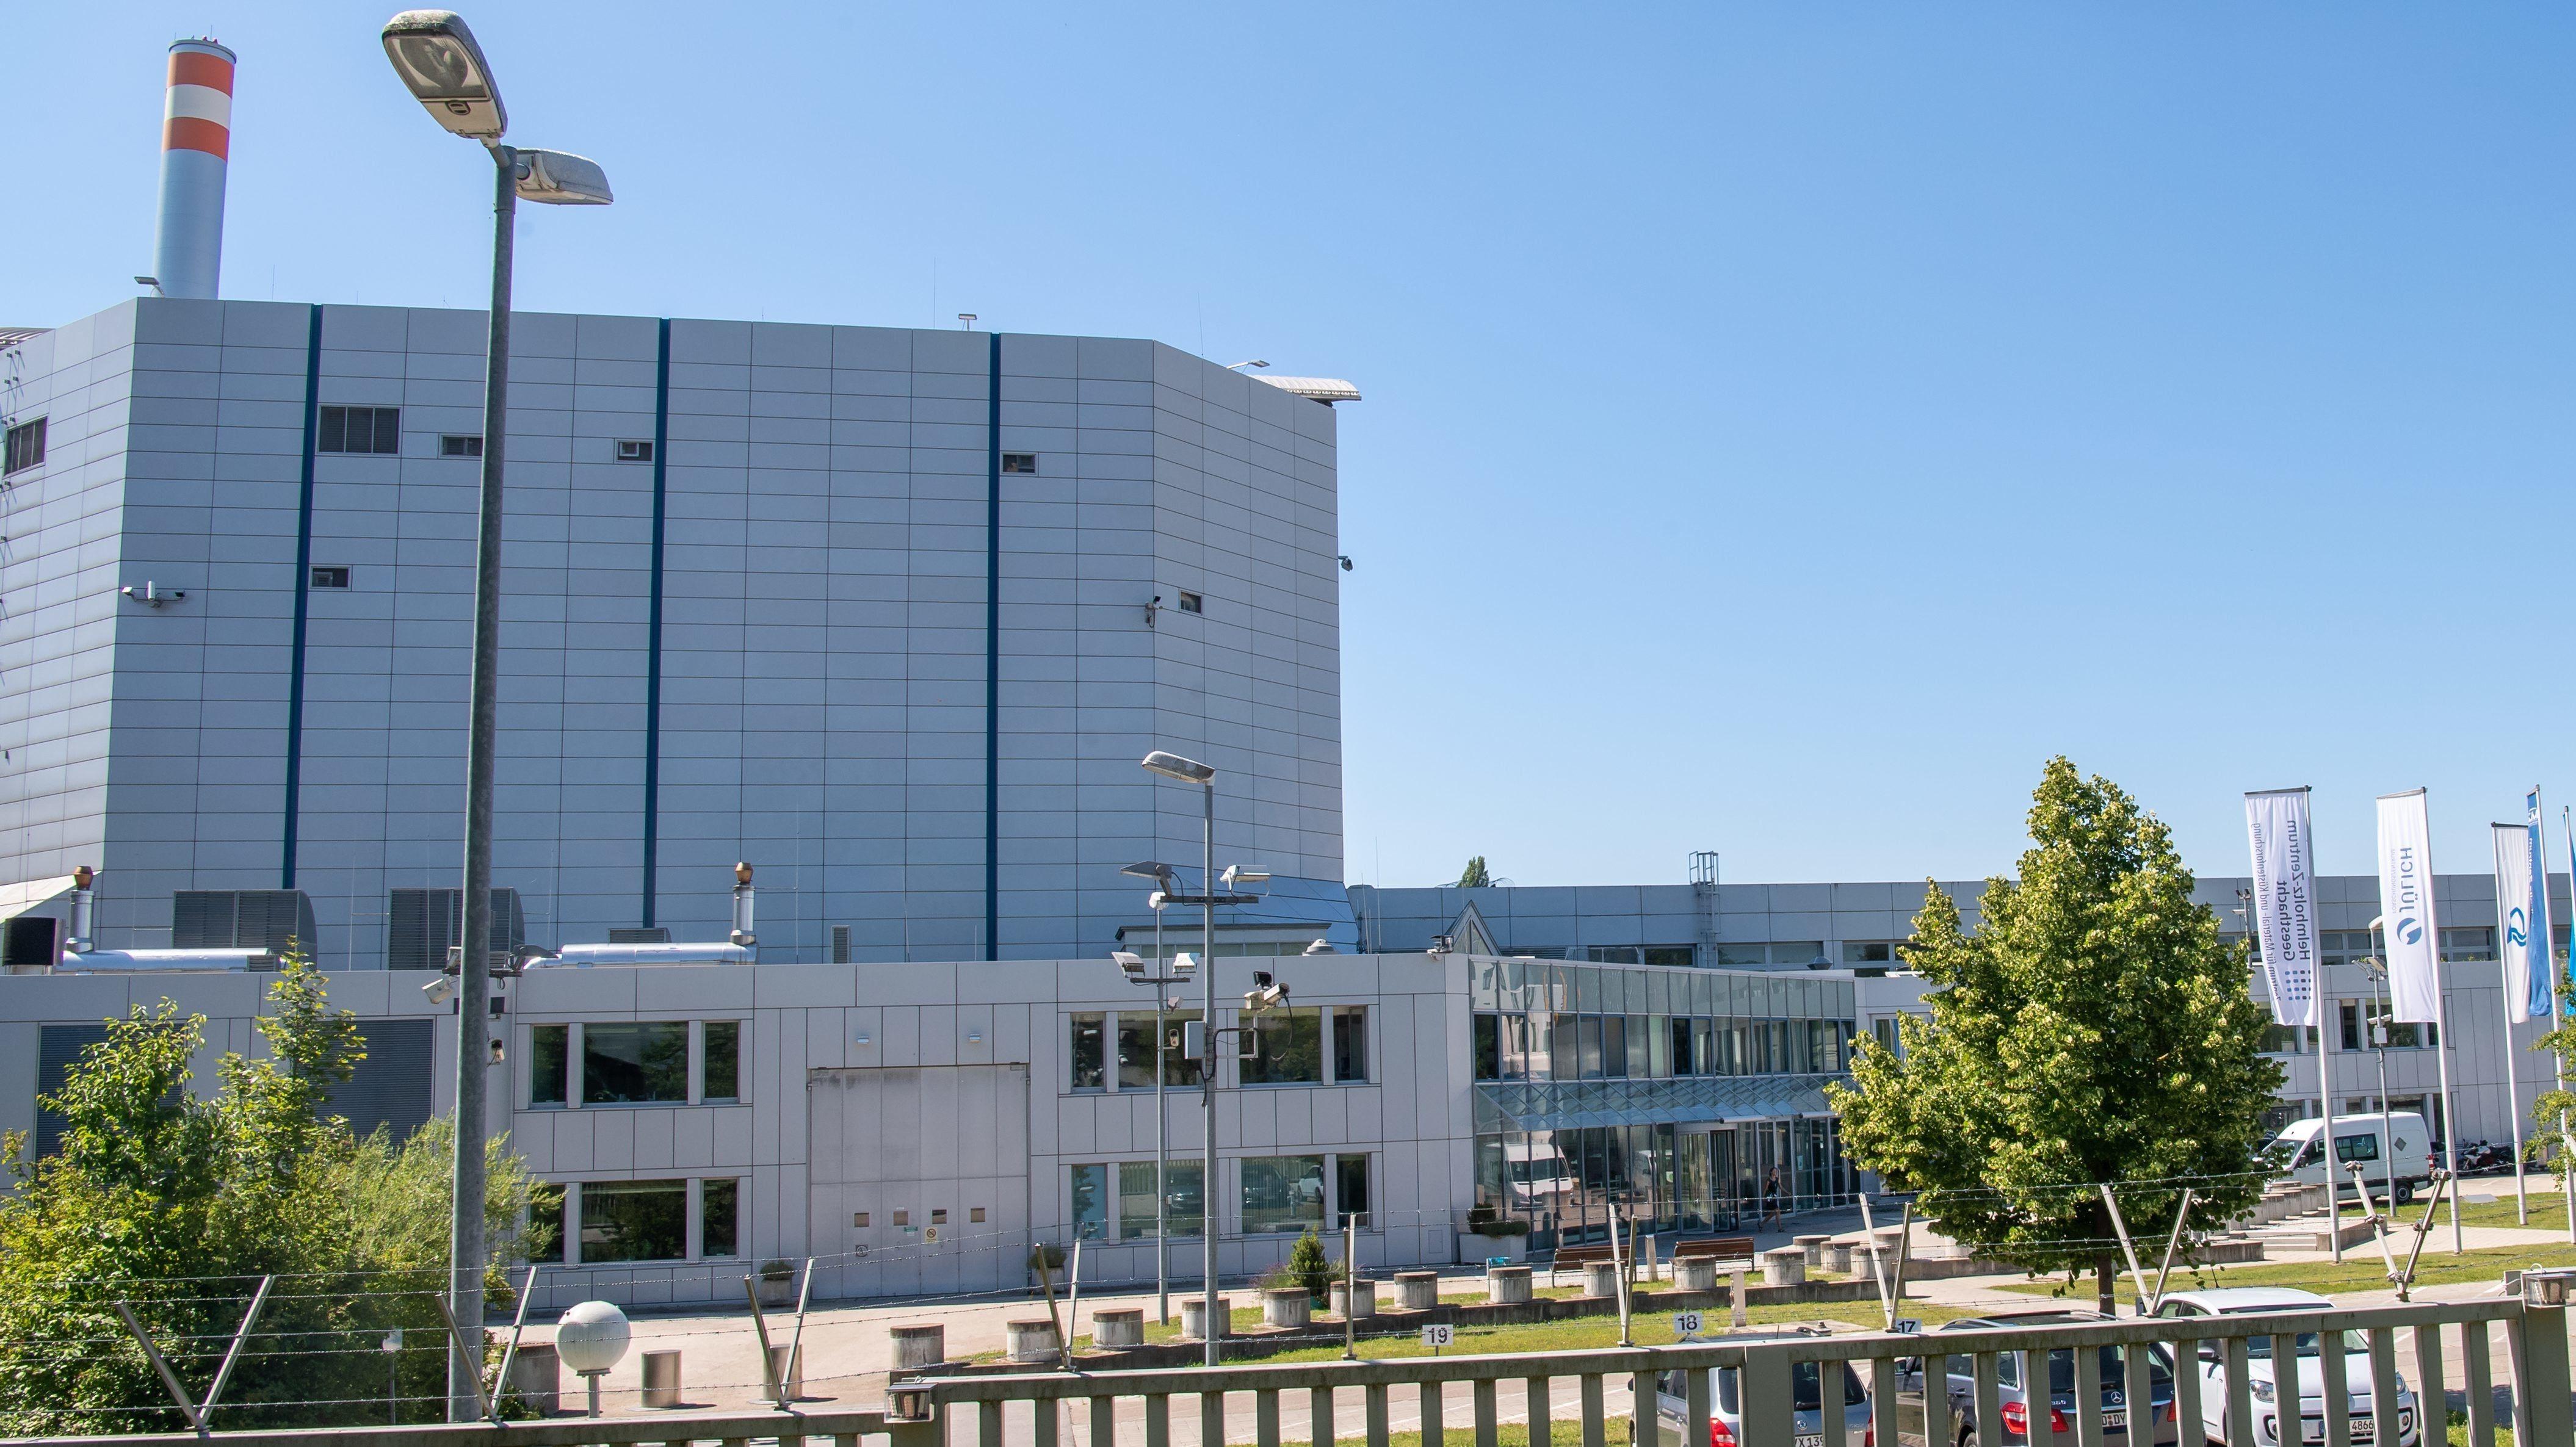 Der Forschungsreaktor München II